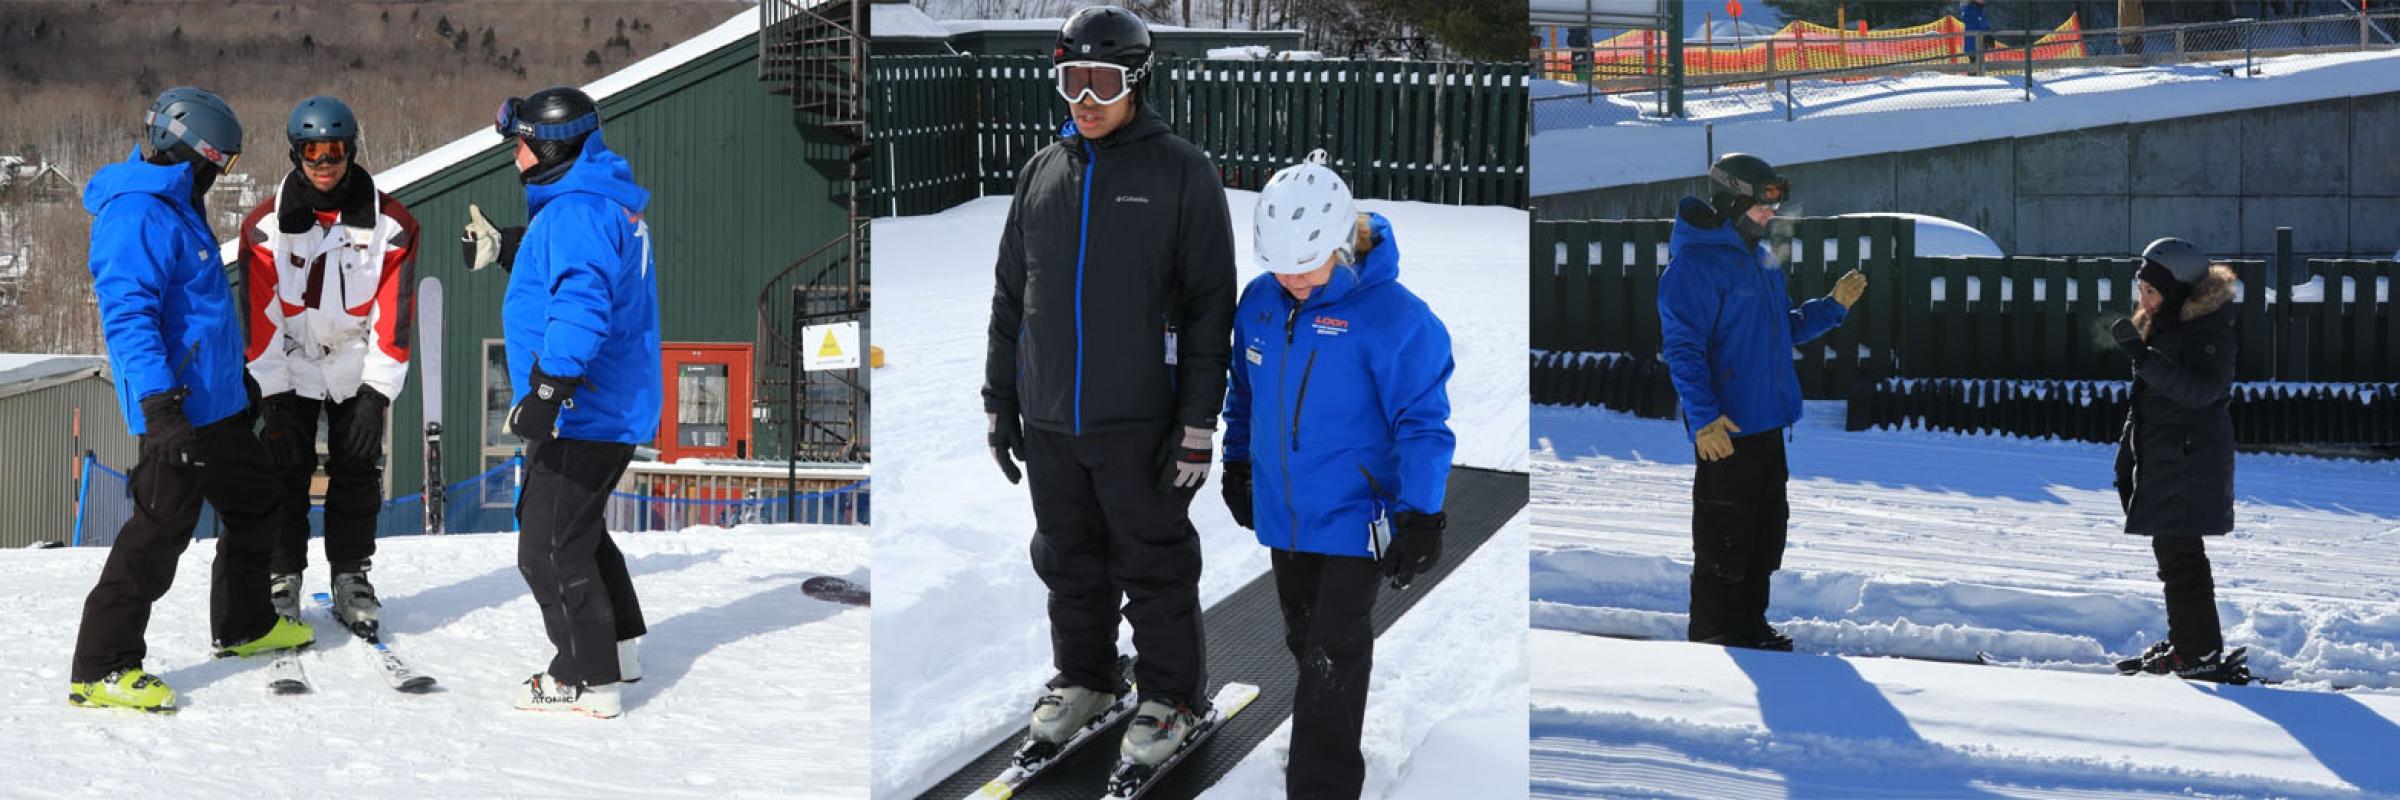 Loon Ski